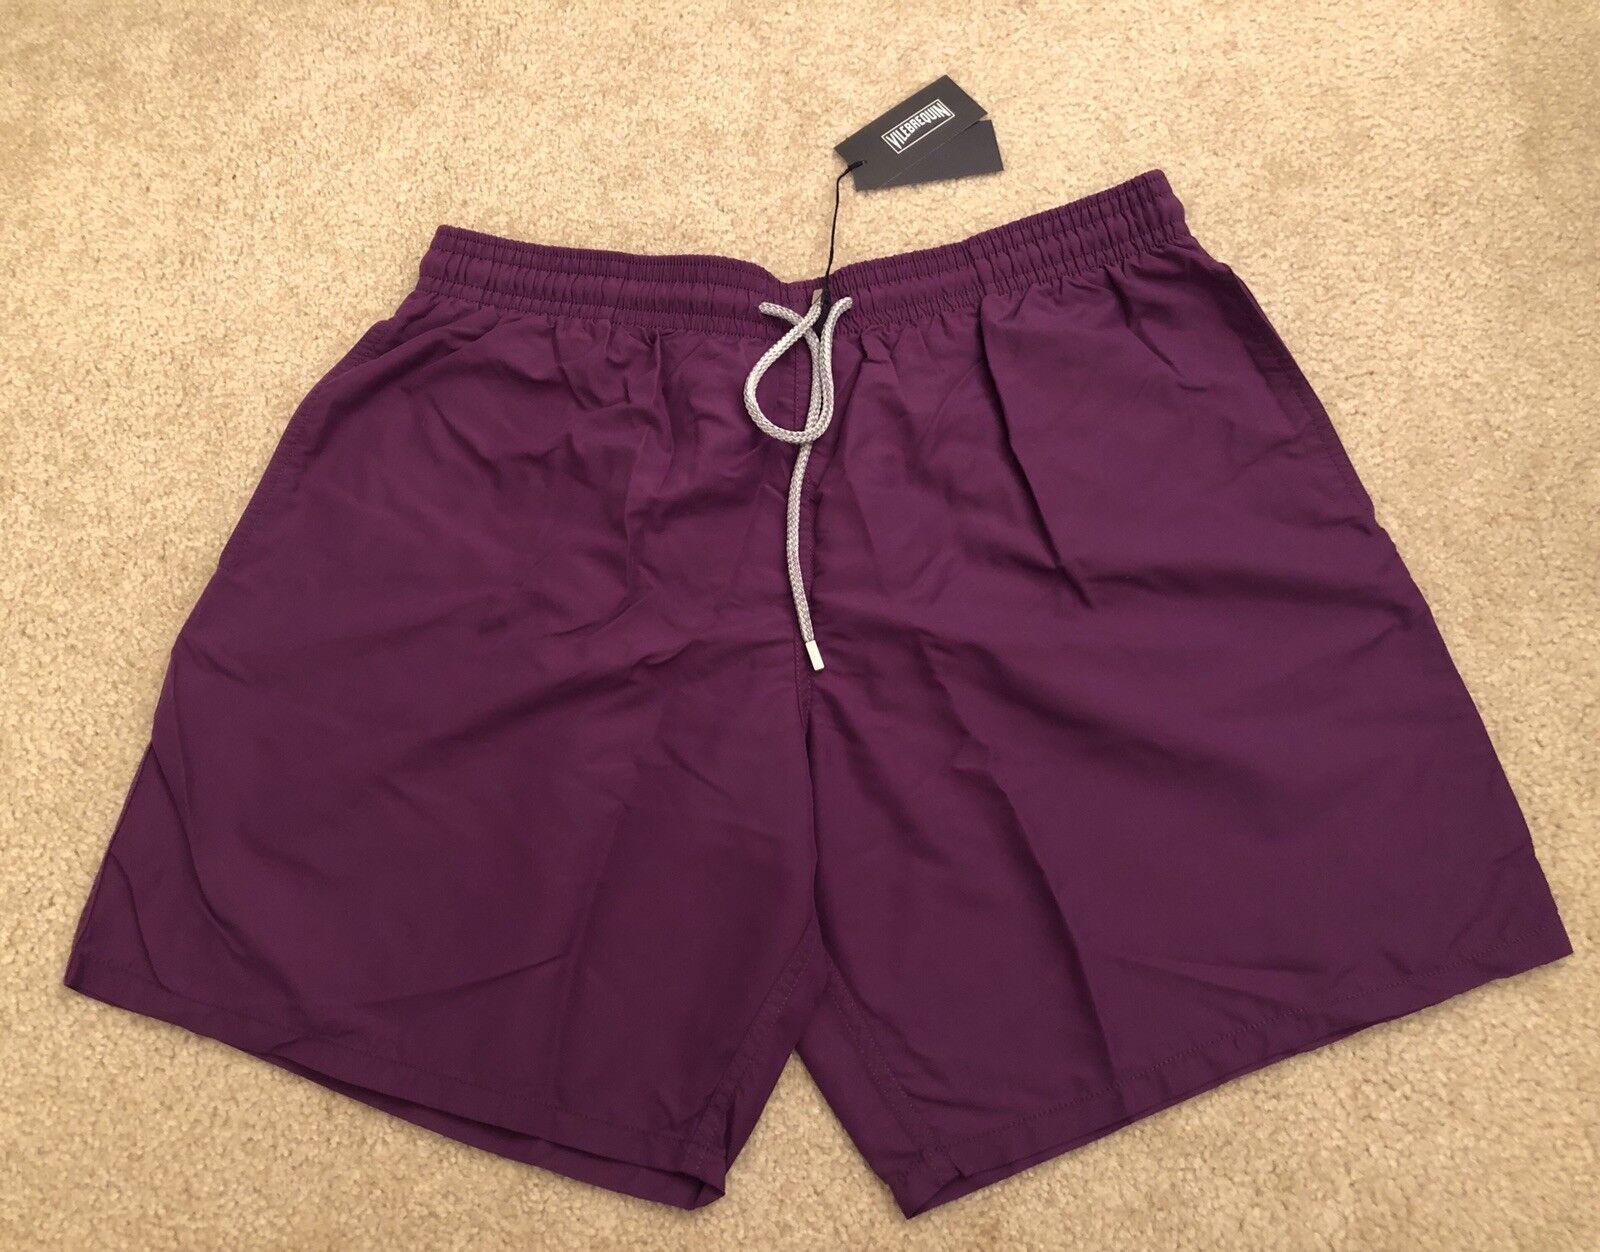 New w Tags Authentic Vilebrequin Moorea Swim Trunks Men - Purple Plum XXXL - 3XL